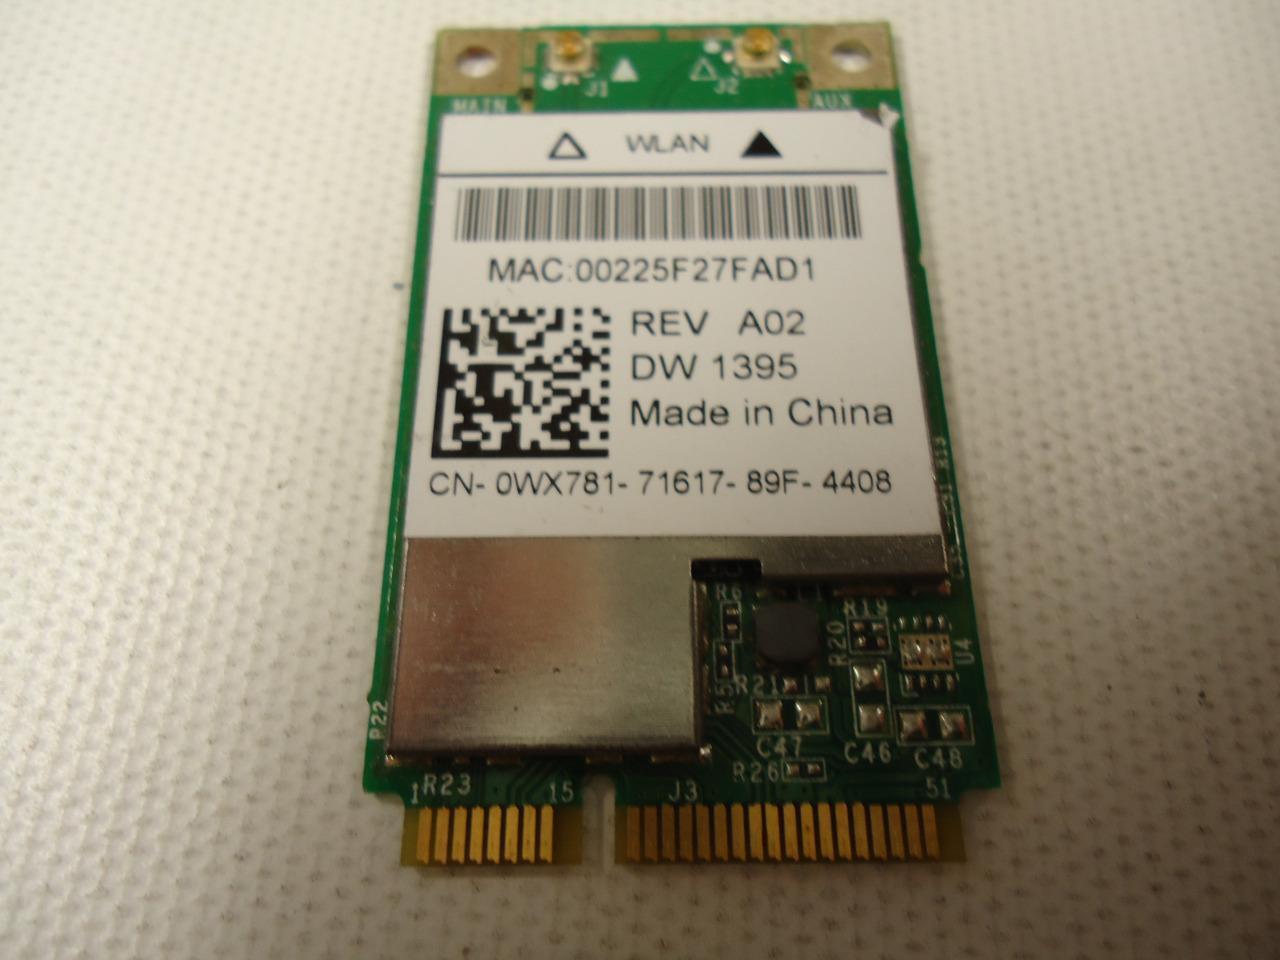 Dell Wireless WLAN Mini-Card Driver for Linux - Dell Community